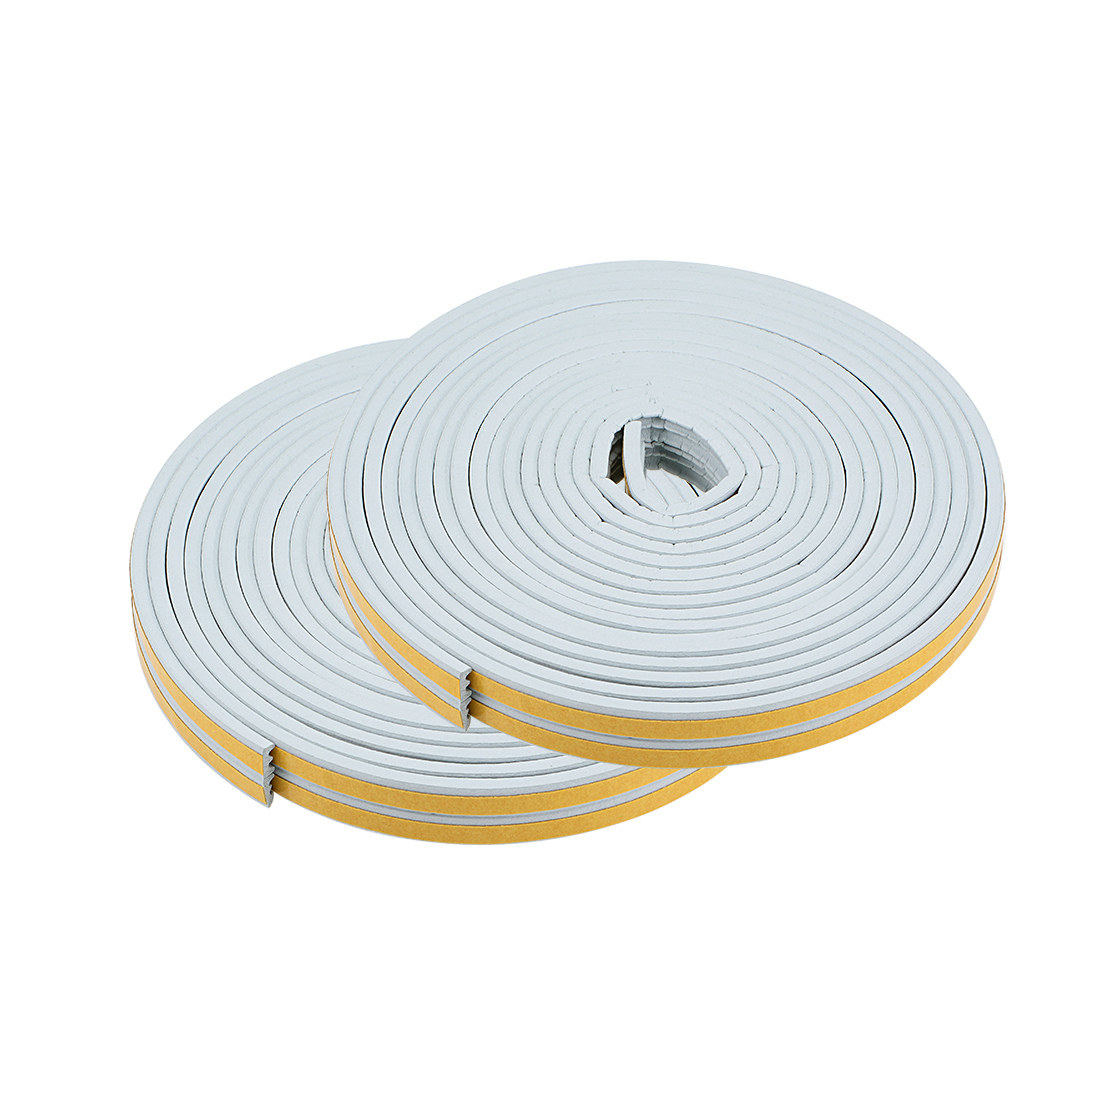 Foam Tape Adhesive 9mm Width 4mm Thick, Total 65.6 Feet Long Gray 4Pcs